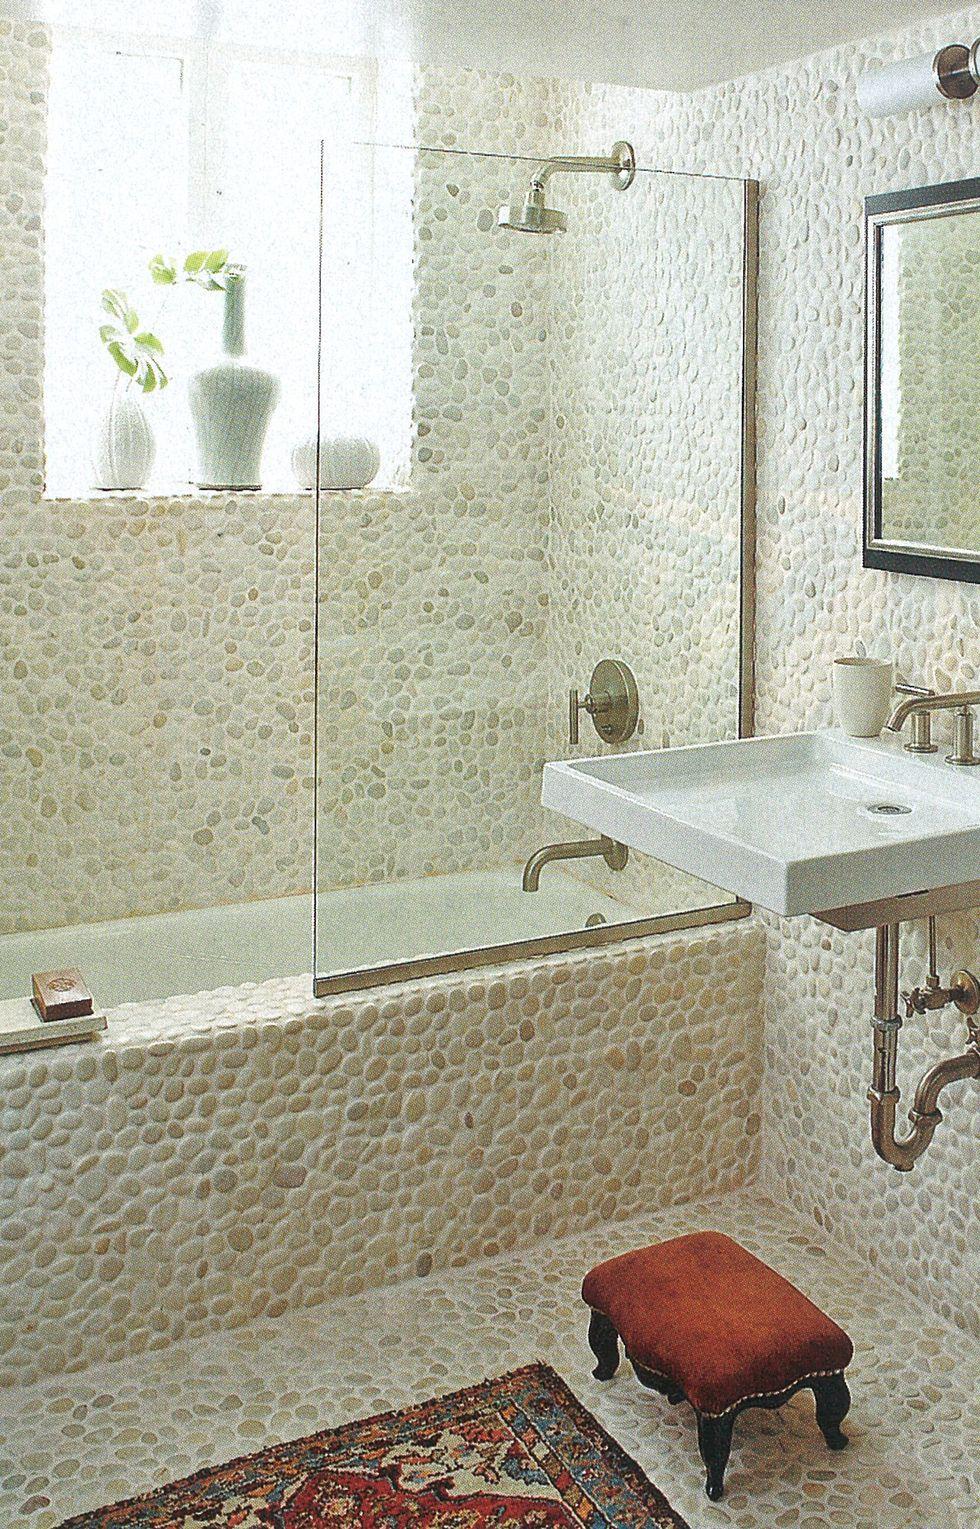 55 Small Bathroom Ideas - Best Designs & Decor for Small Bathrooms